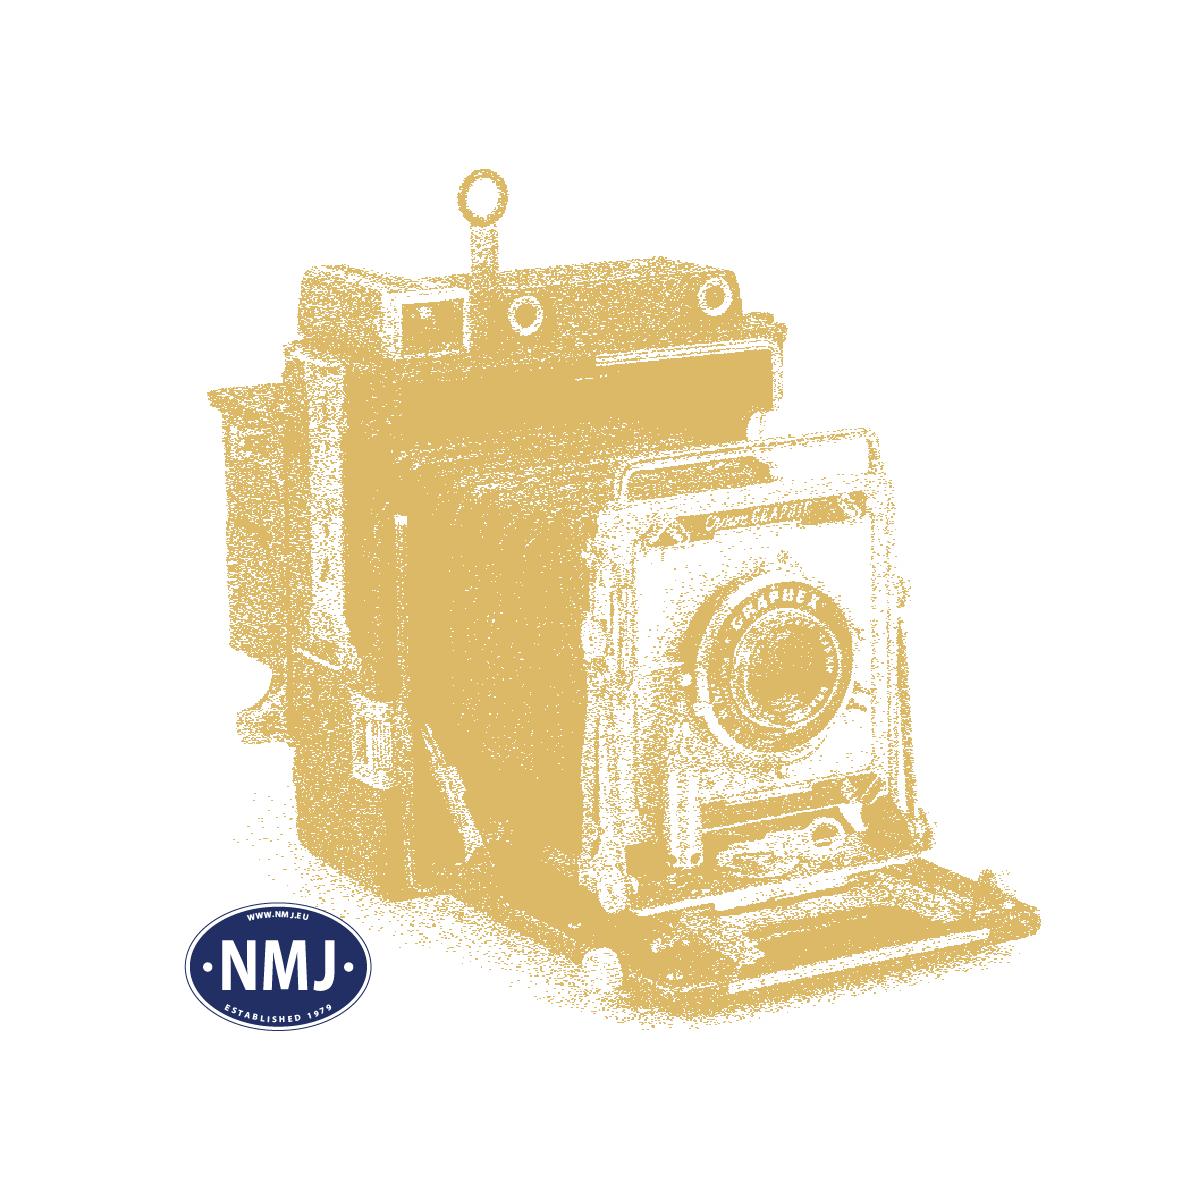 NMJST3-6 - *NMJ 40 ÅR* - NMJ Superline NSB T3 Stakevogn m/ Bremseplattform